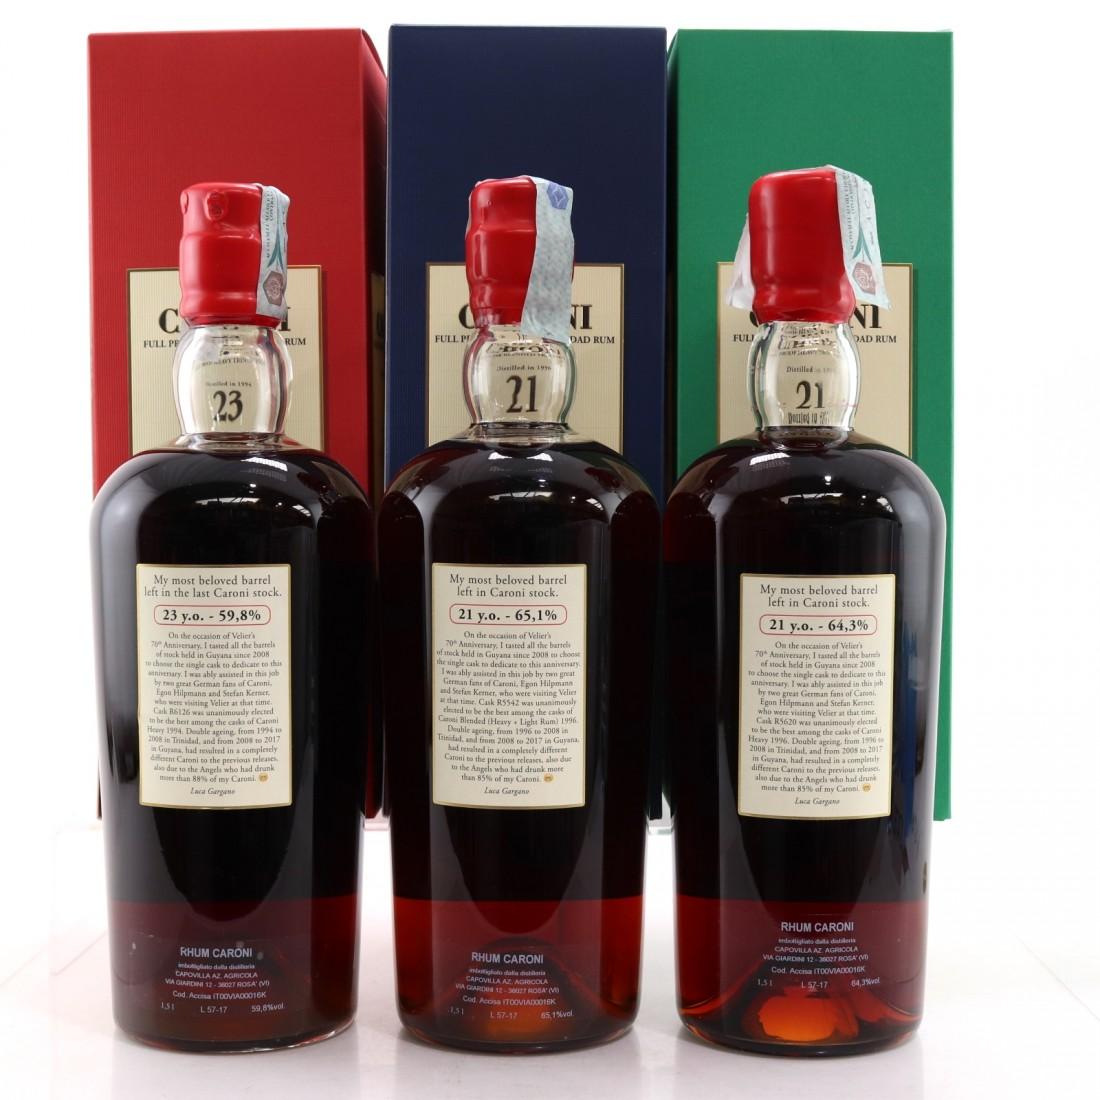 Caroni Magnum Collection 3 x 1.5 Litre / Velier 70th Anniversary